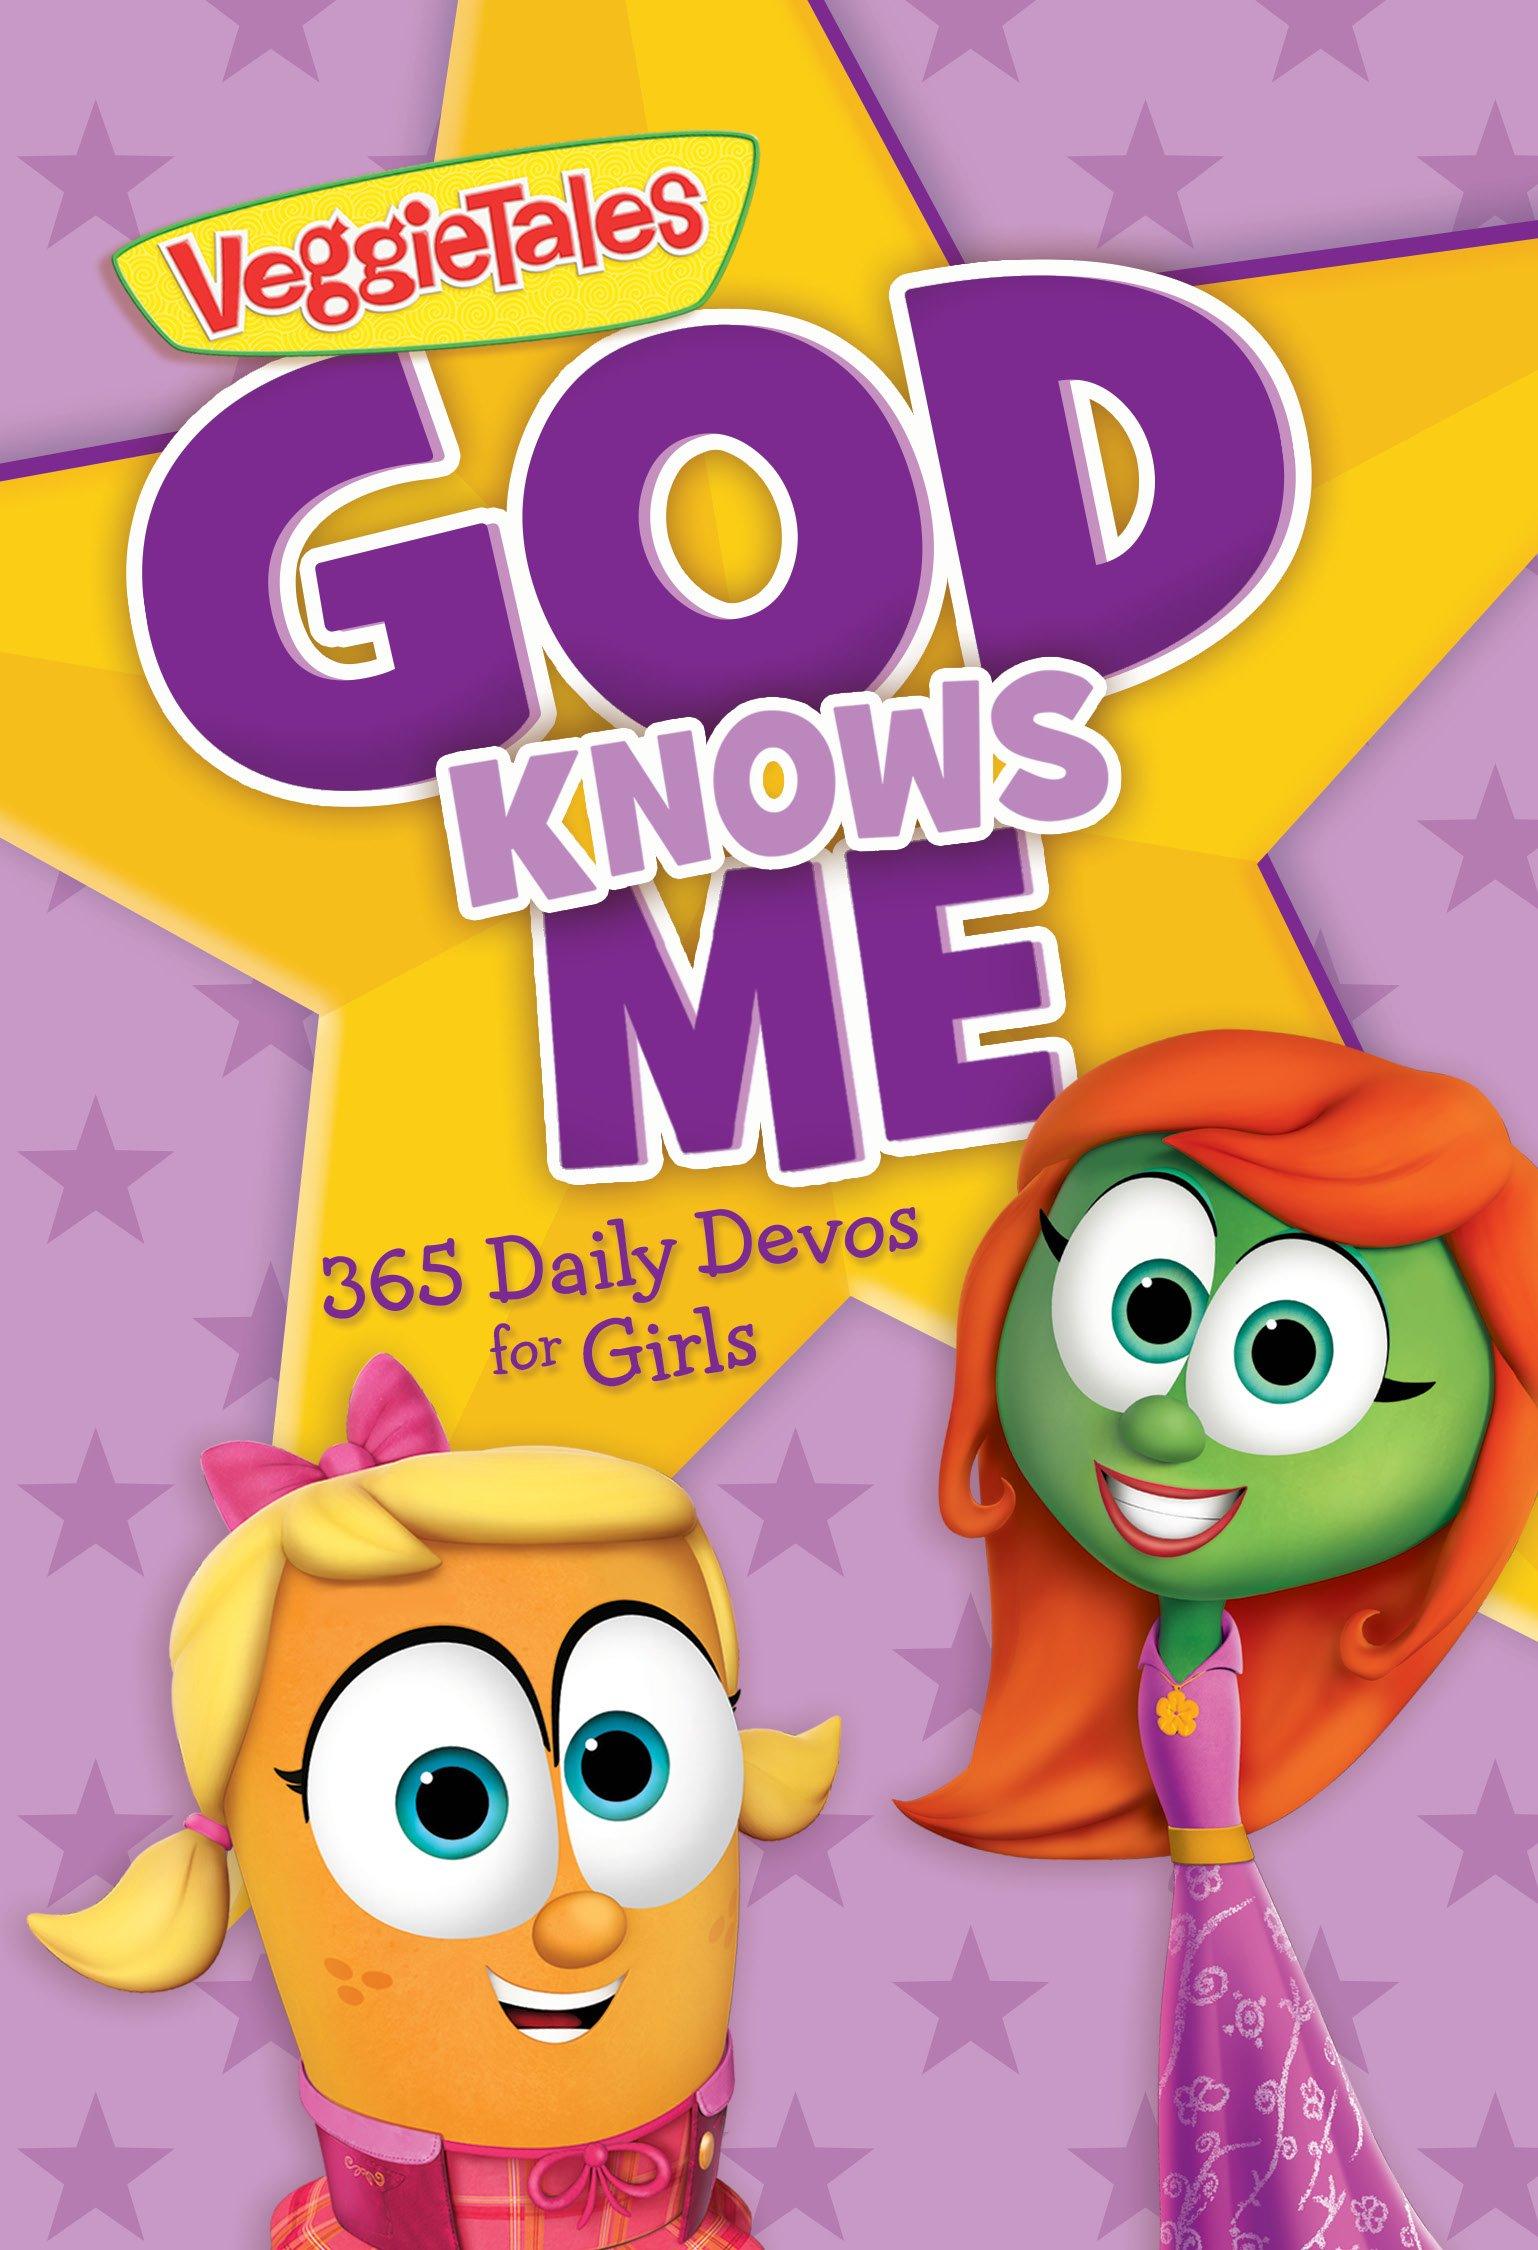 God Knows Me: 365 Daily Devos for Girls (VeggieTales) pdf